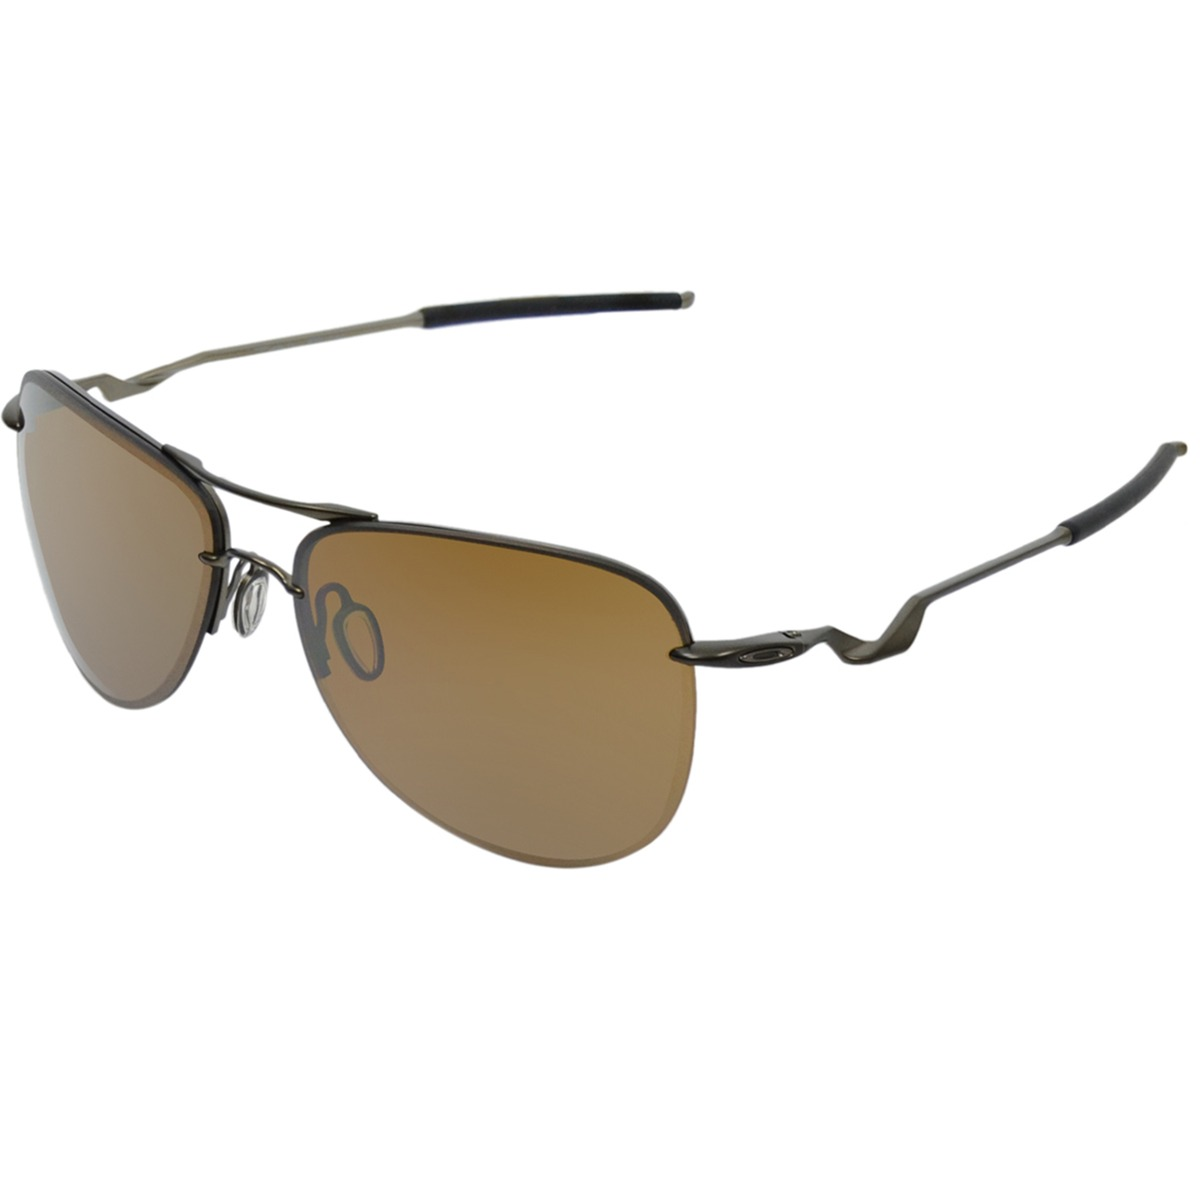 Óculos Oakley Tailpin - R  499,90 em Mercado Livre 029dbebf9c